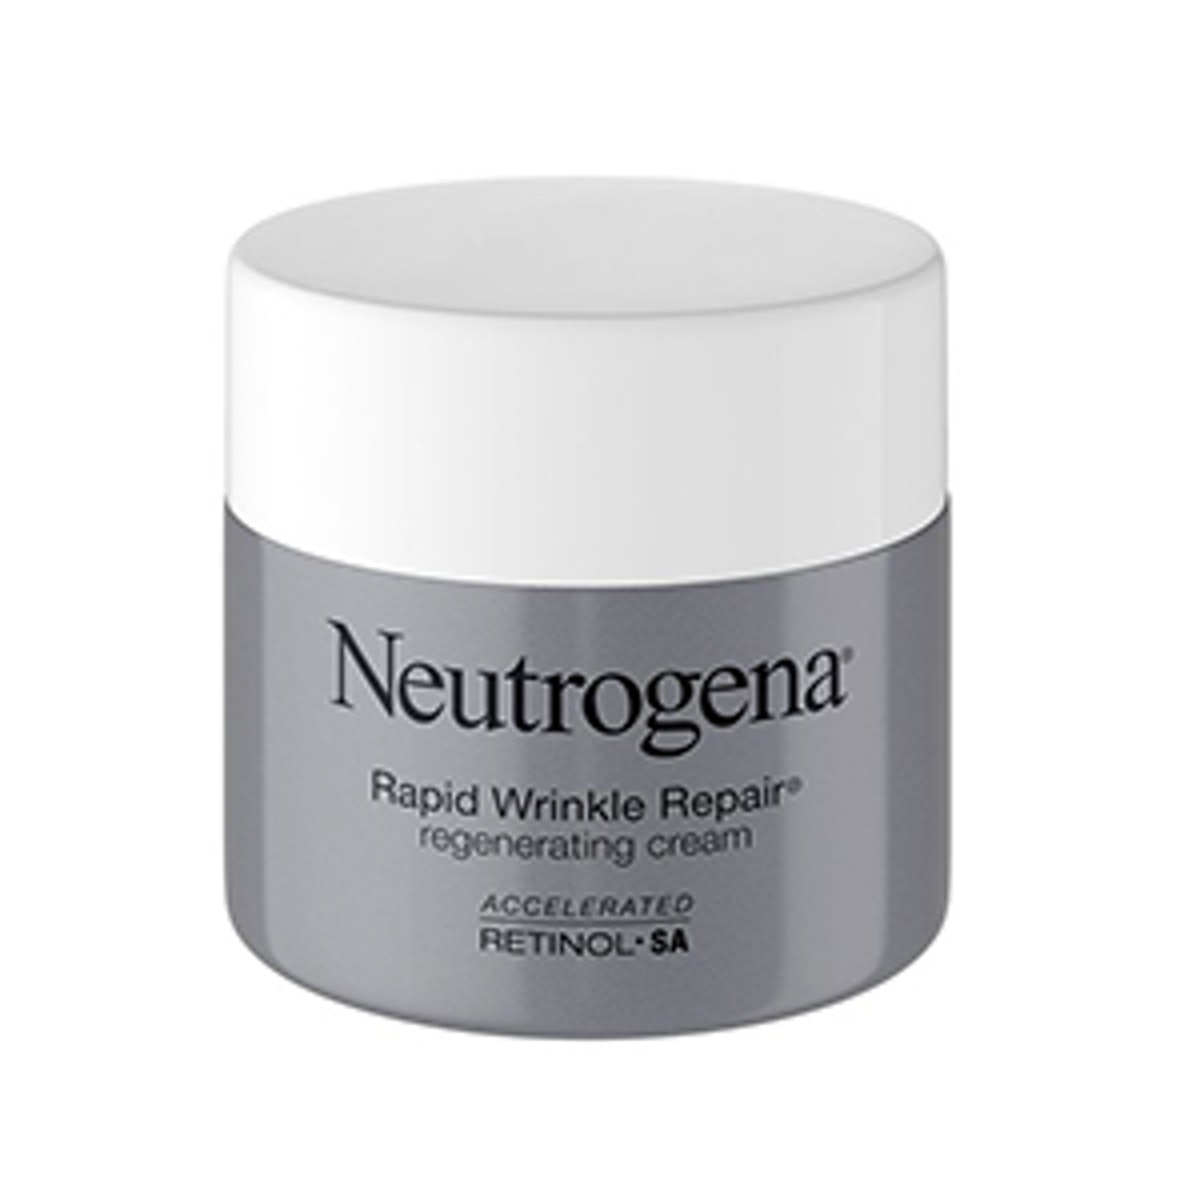 Neutrogena Rapid Wrinkle Repair® Regenerating Cream